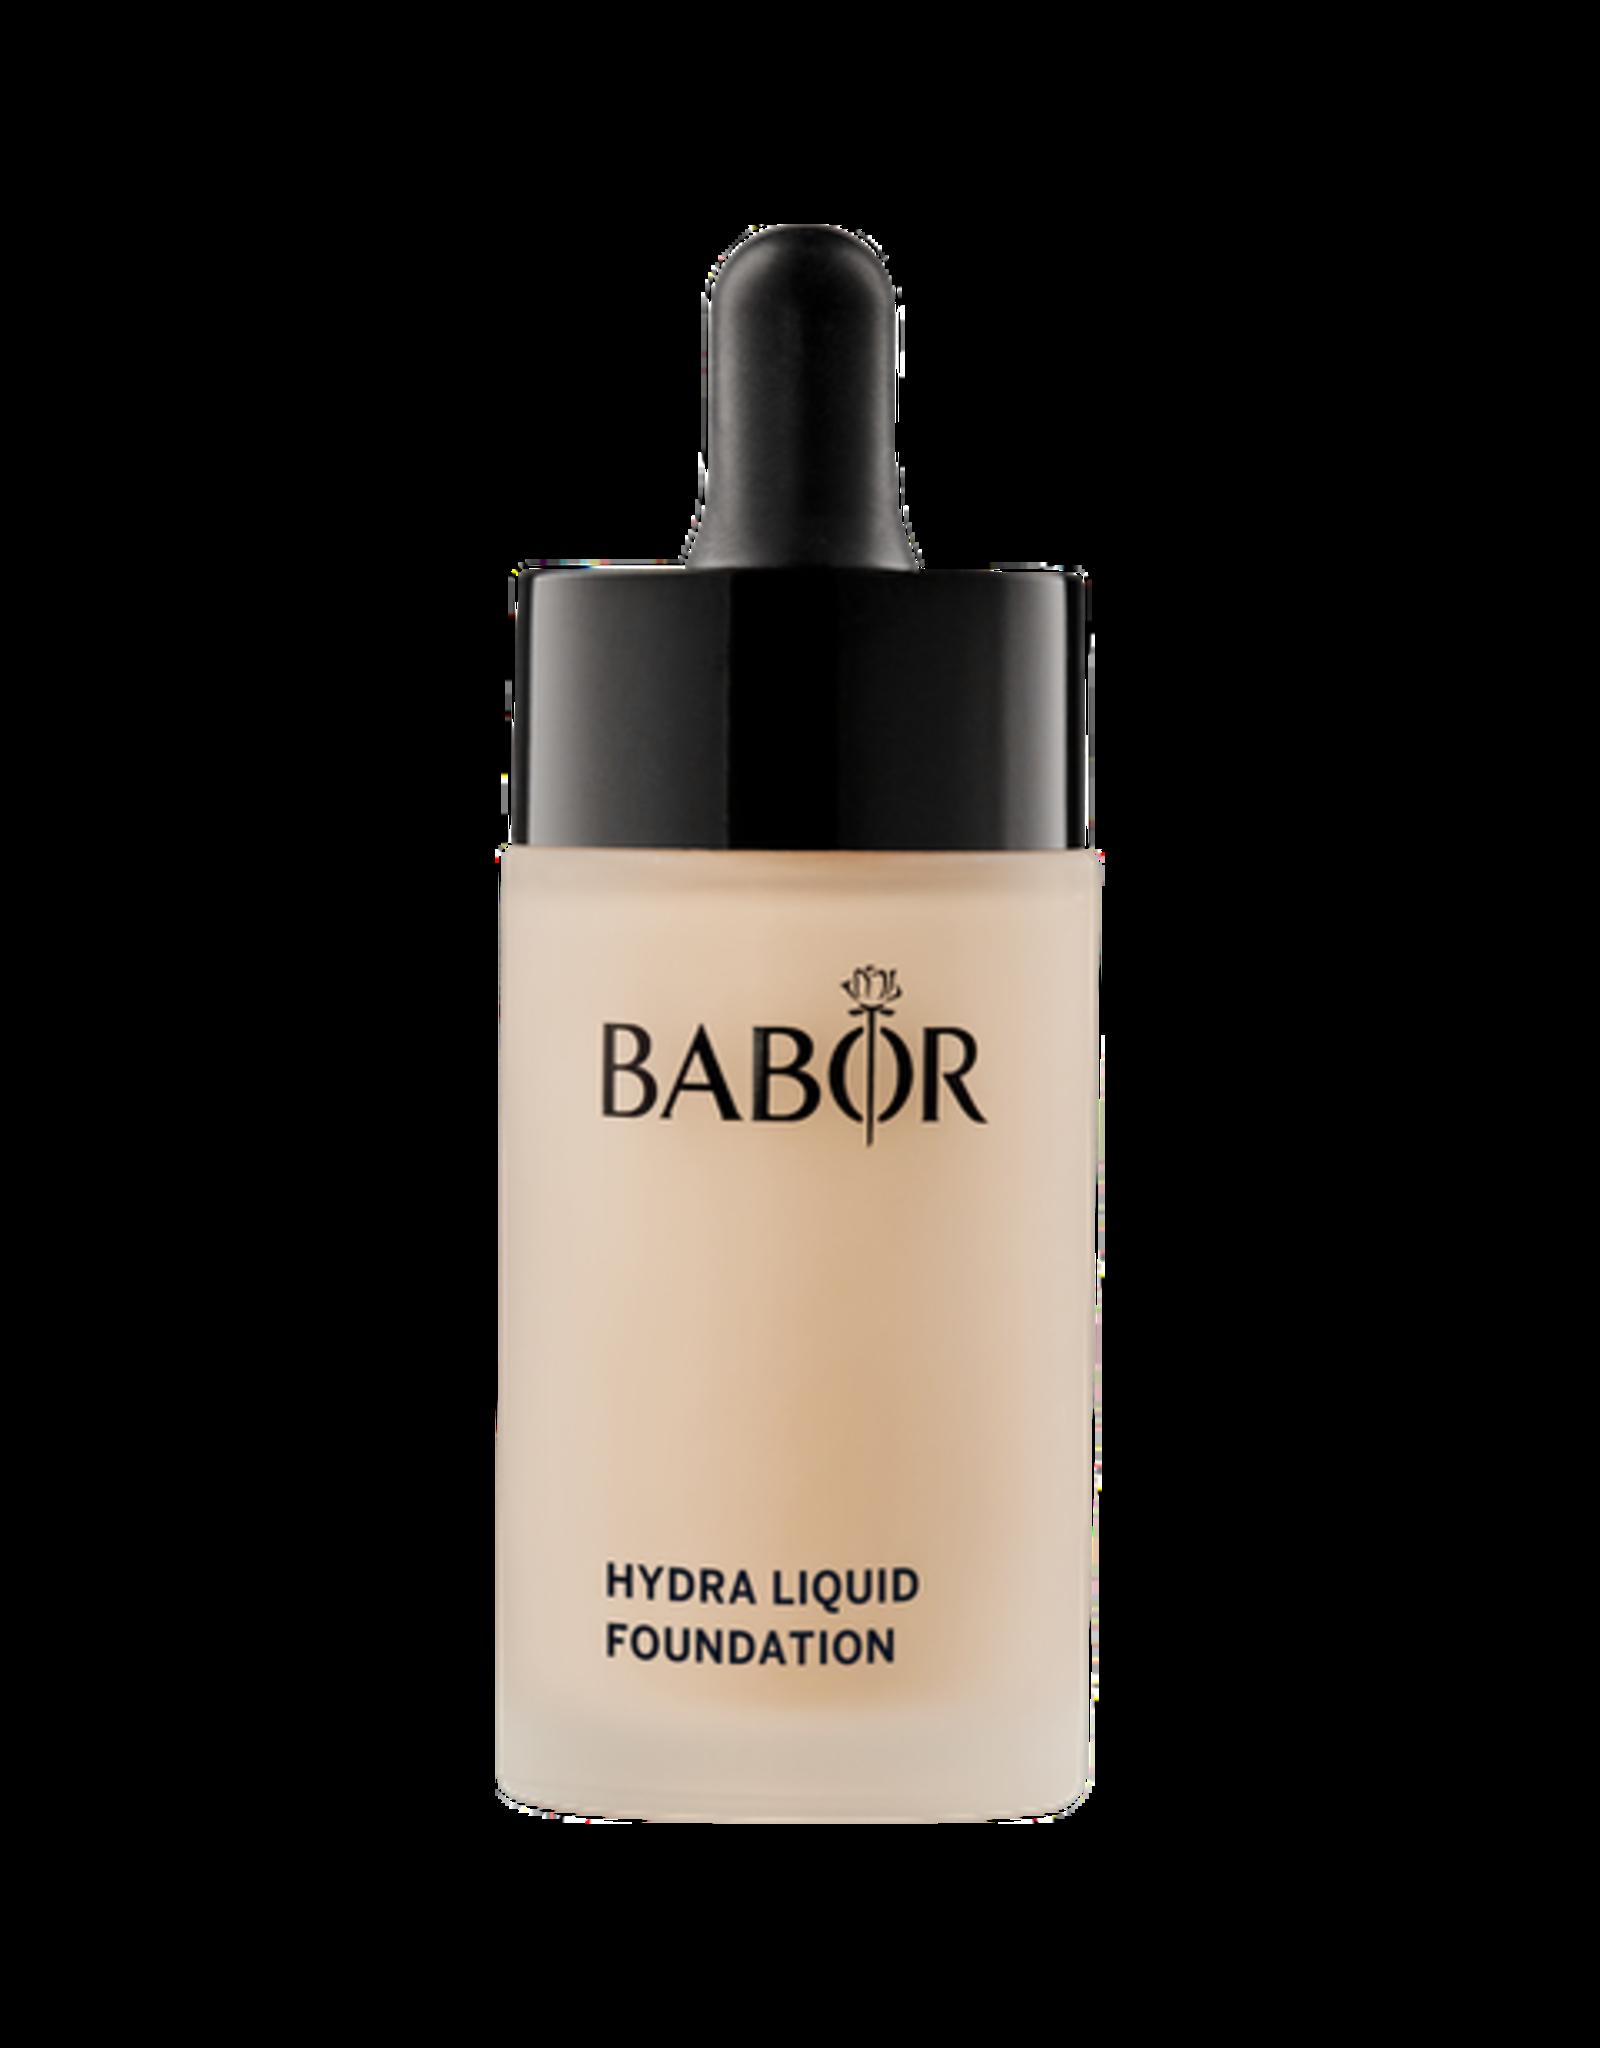 BABOR HYDRA LIQUID FOUNDATION 06 NATURAL